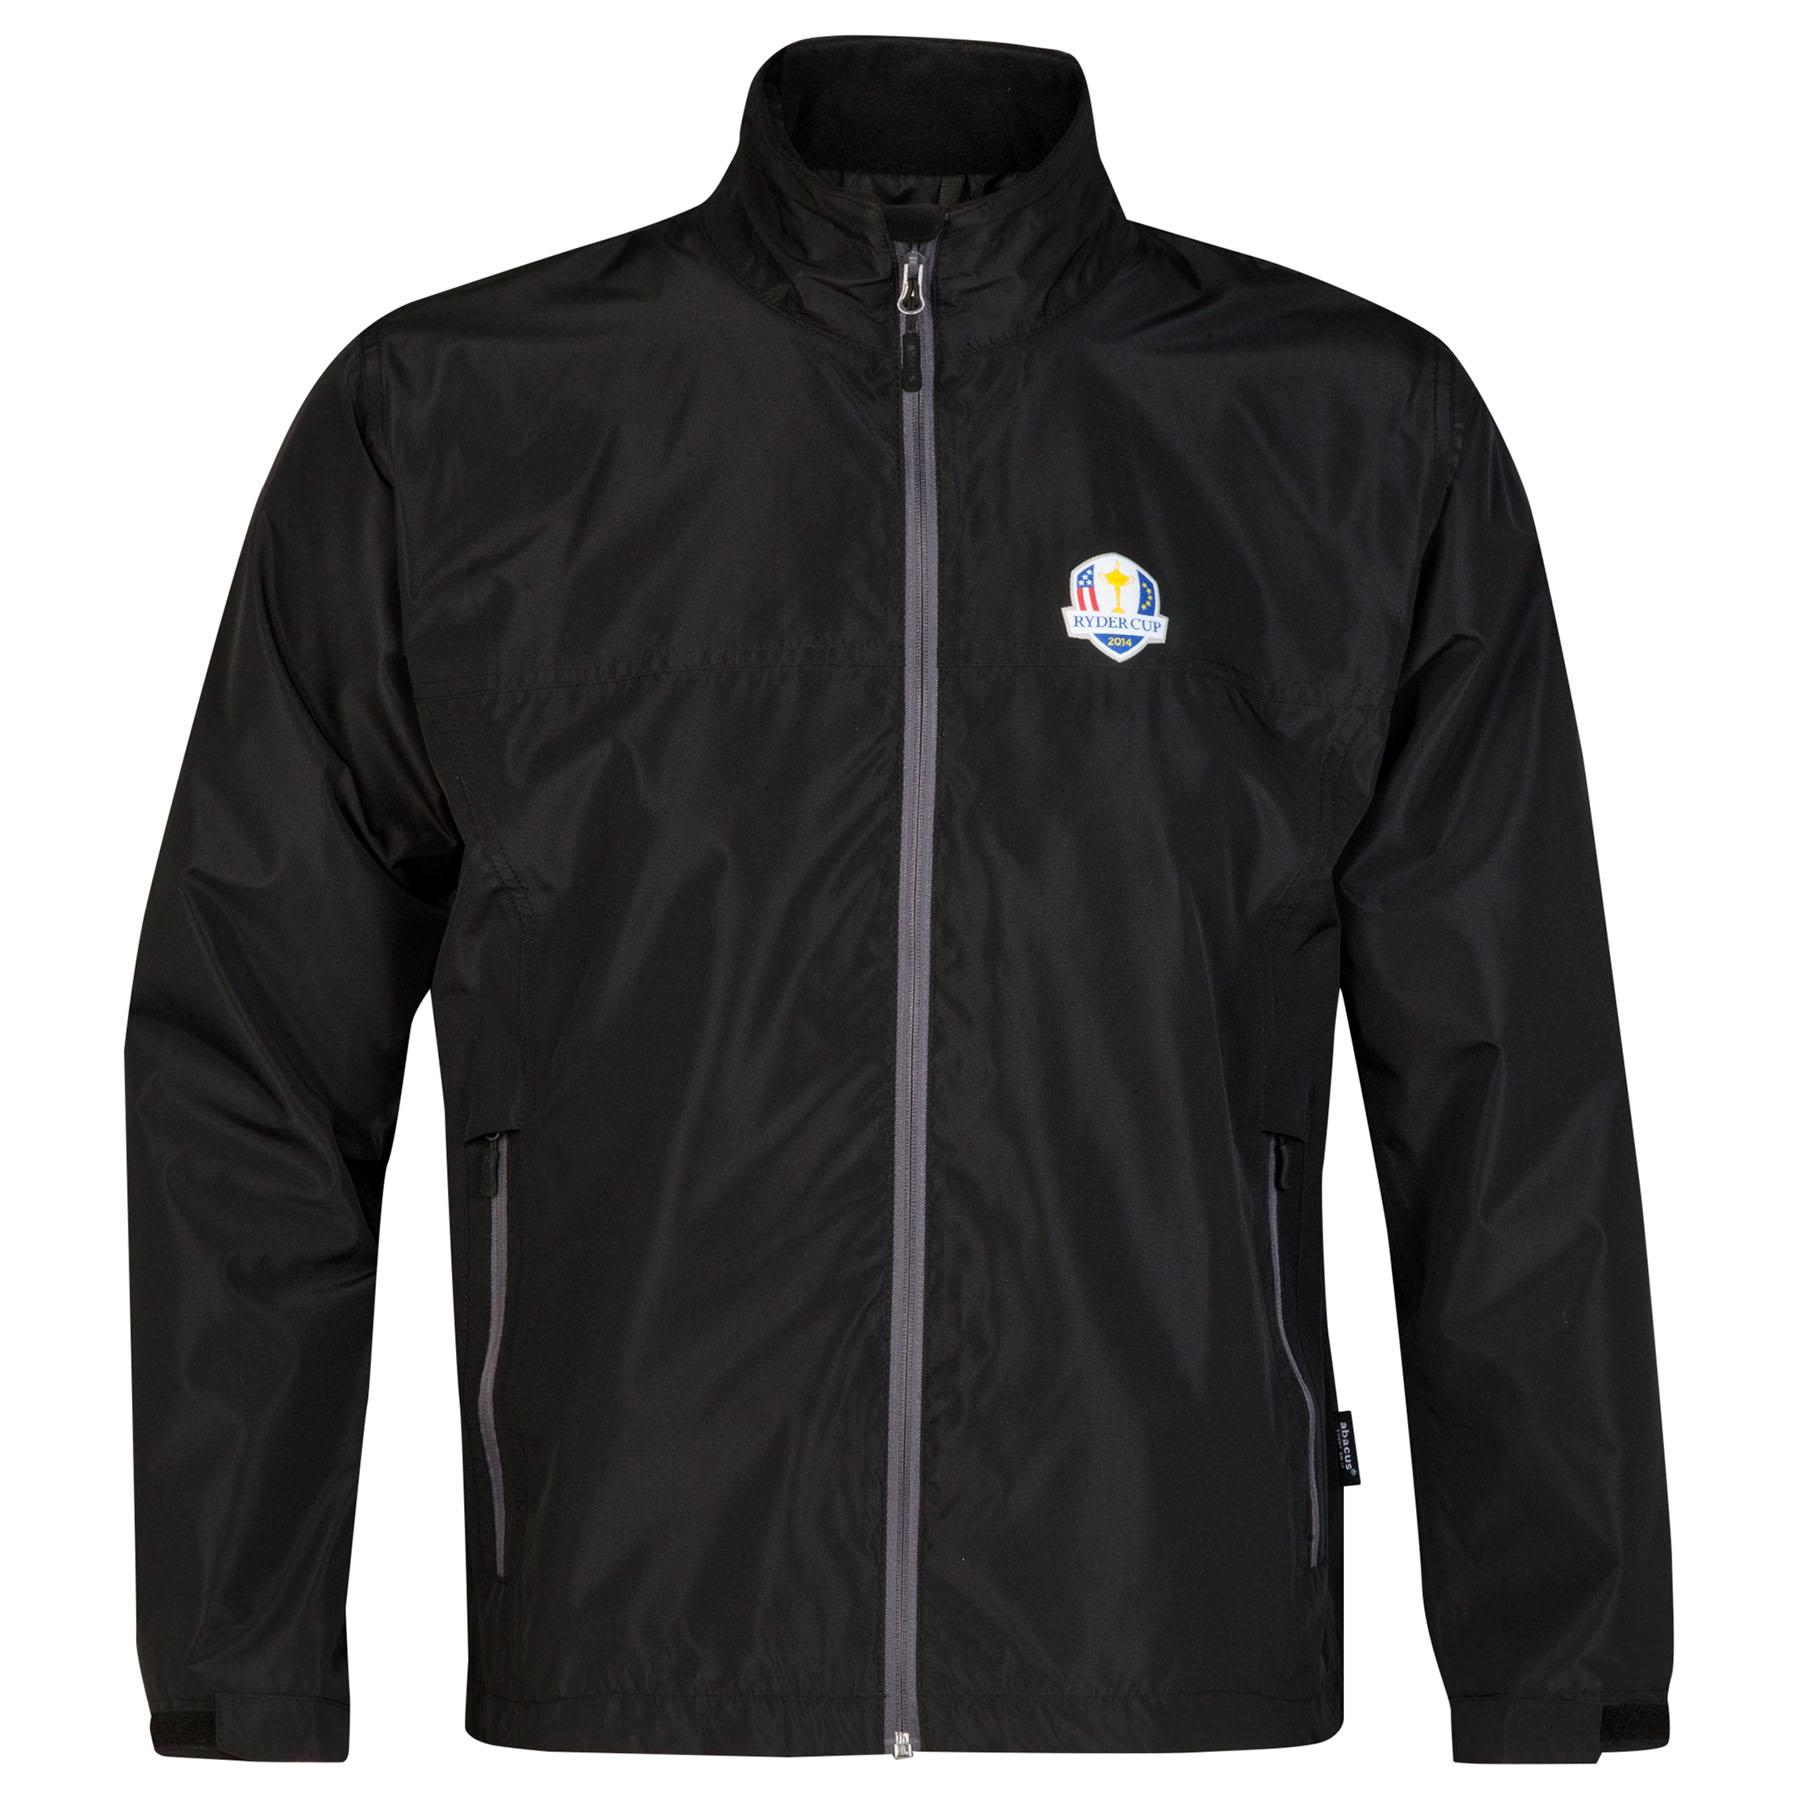 The 2014 Ryder Cup abacus Mens Dixon Rain Jacket - Black